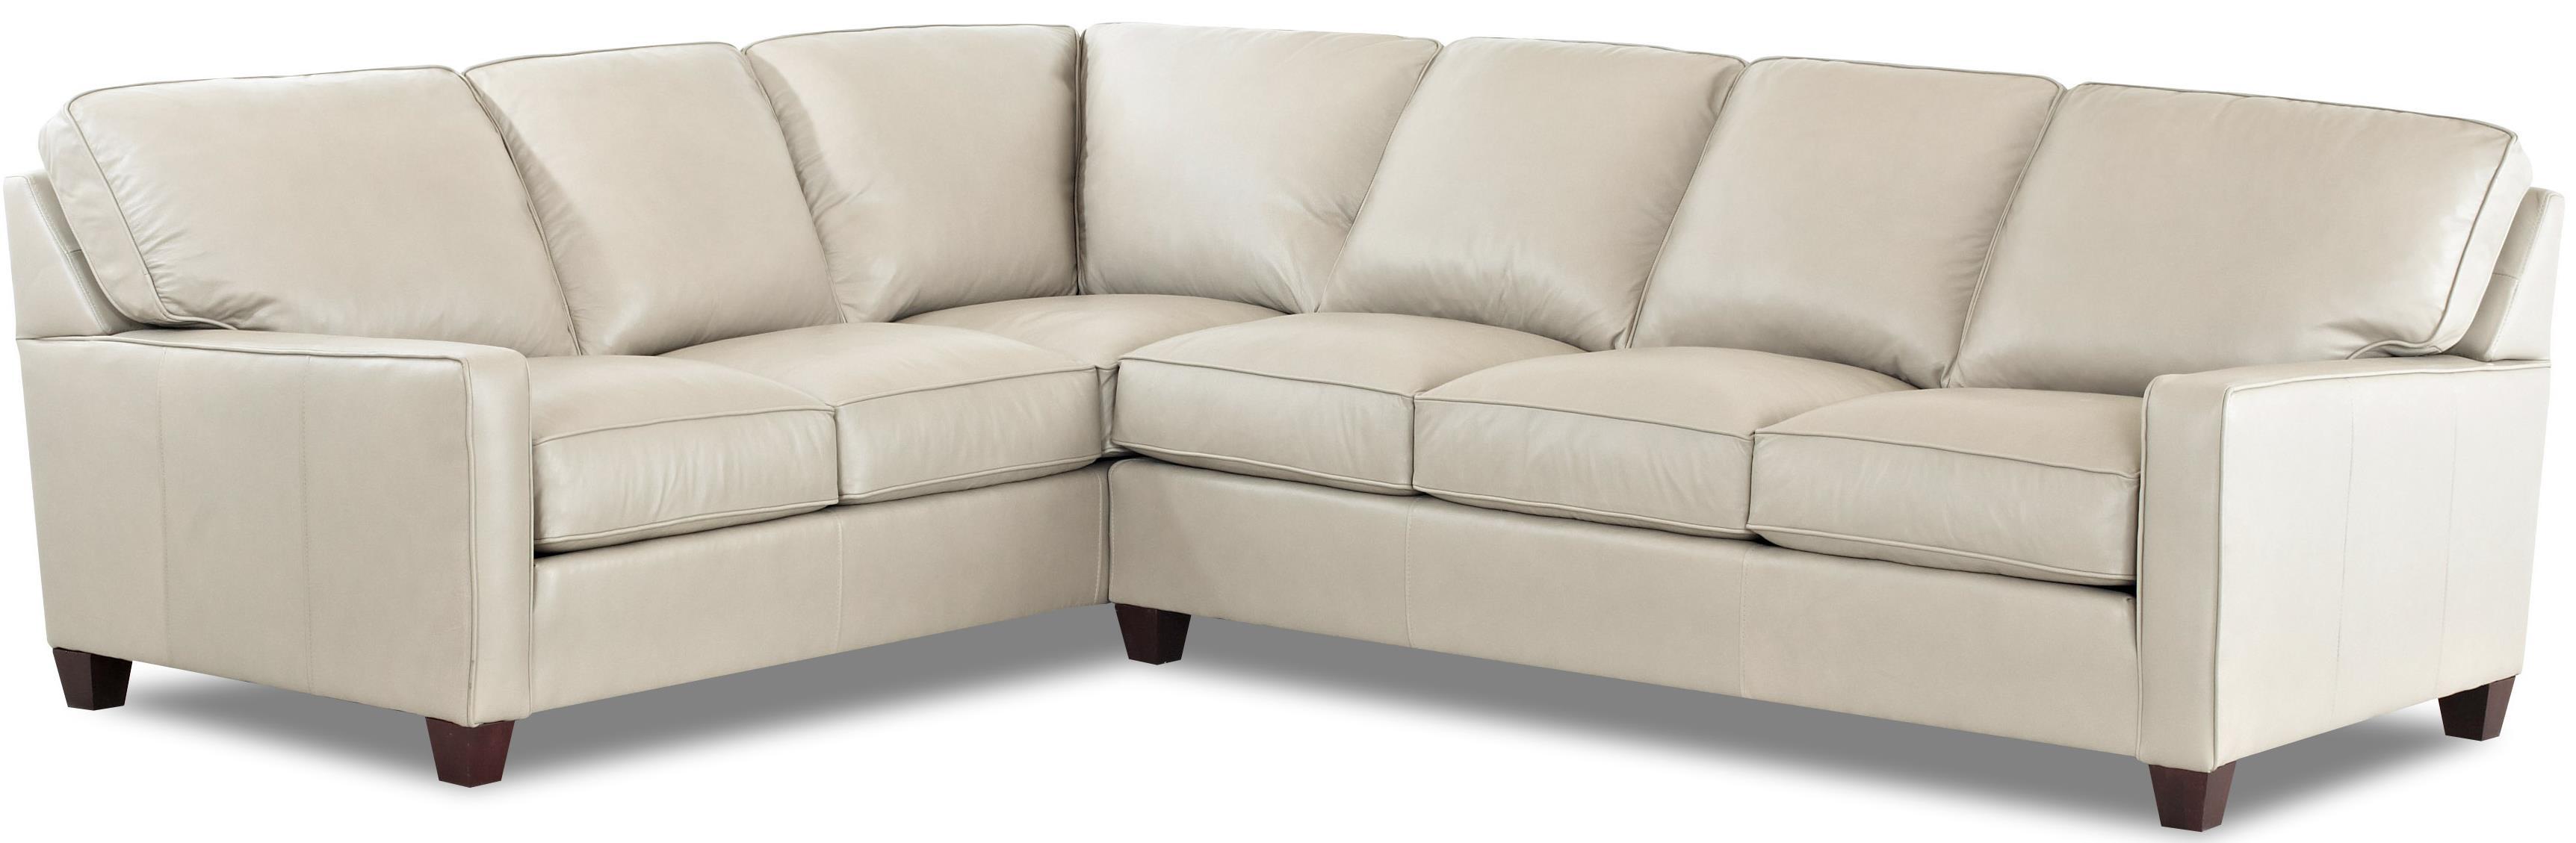 Comfort Design Ausie Sectional Sofa Group Furniture Barn